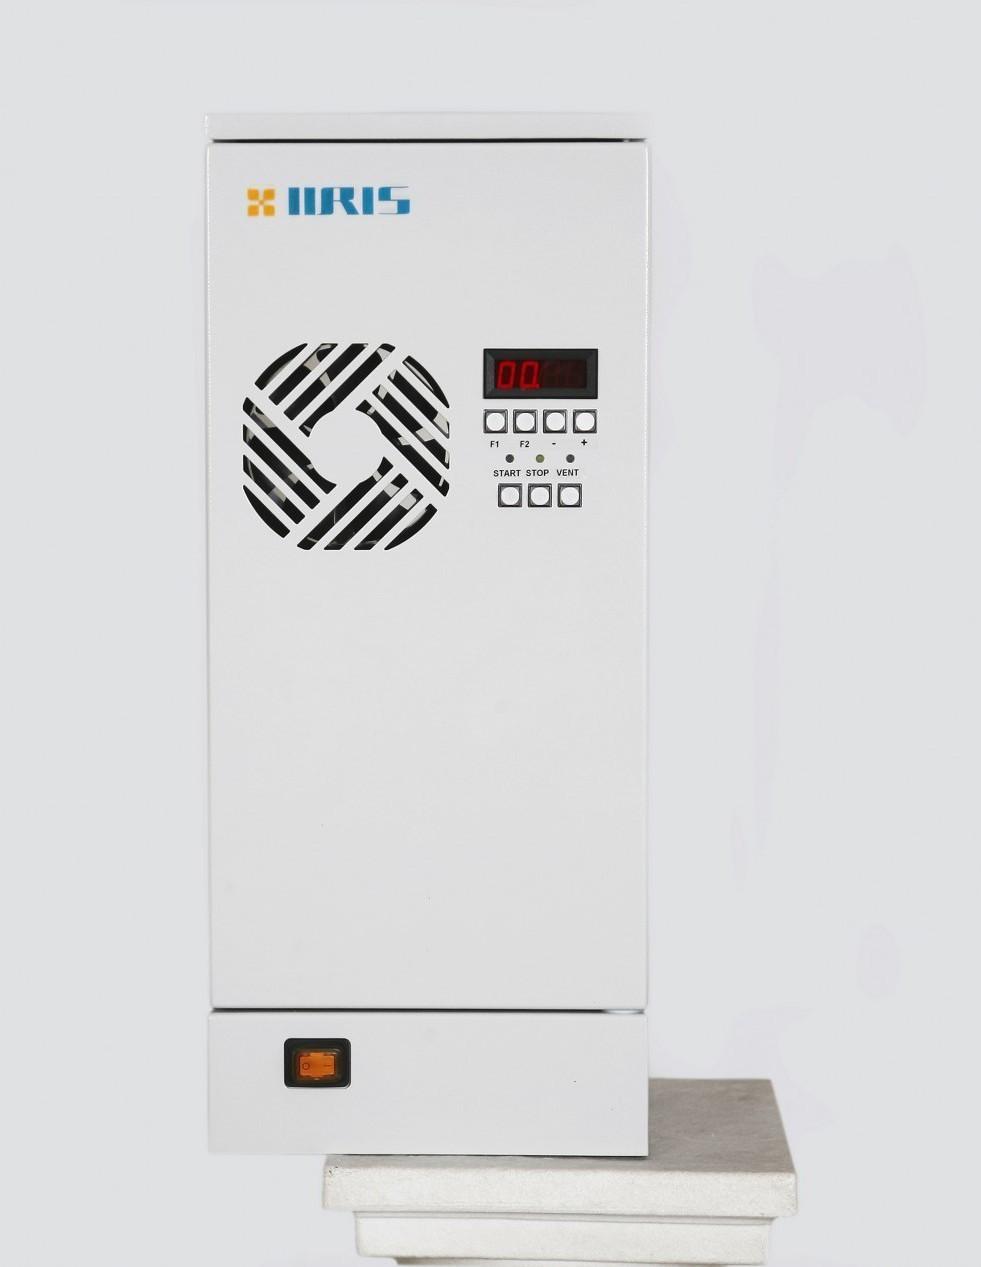 HALOGENERATOR IIRIS-36